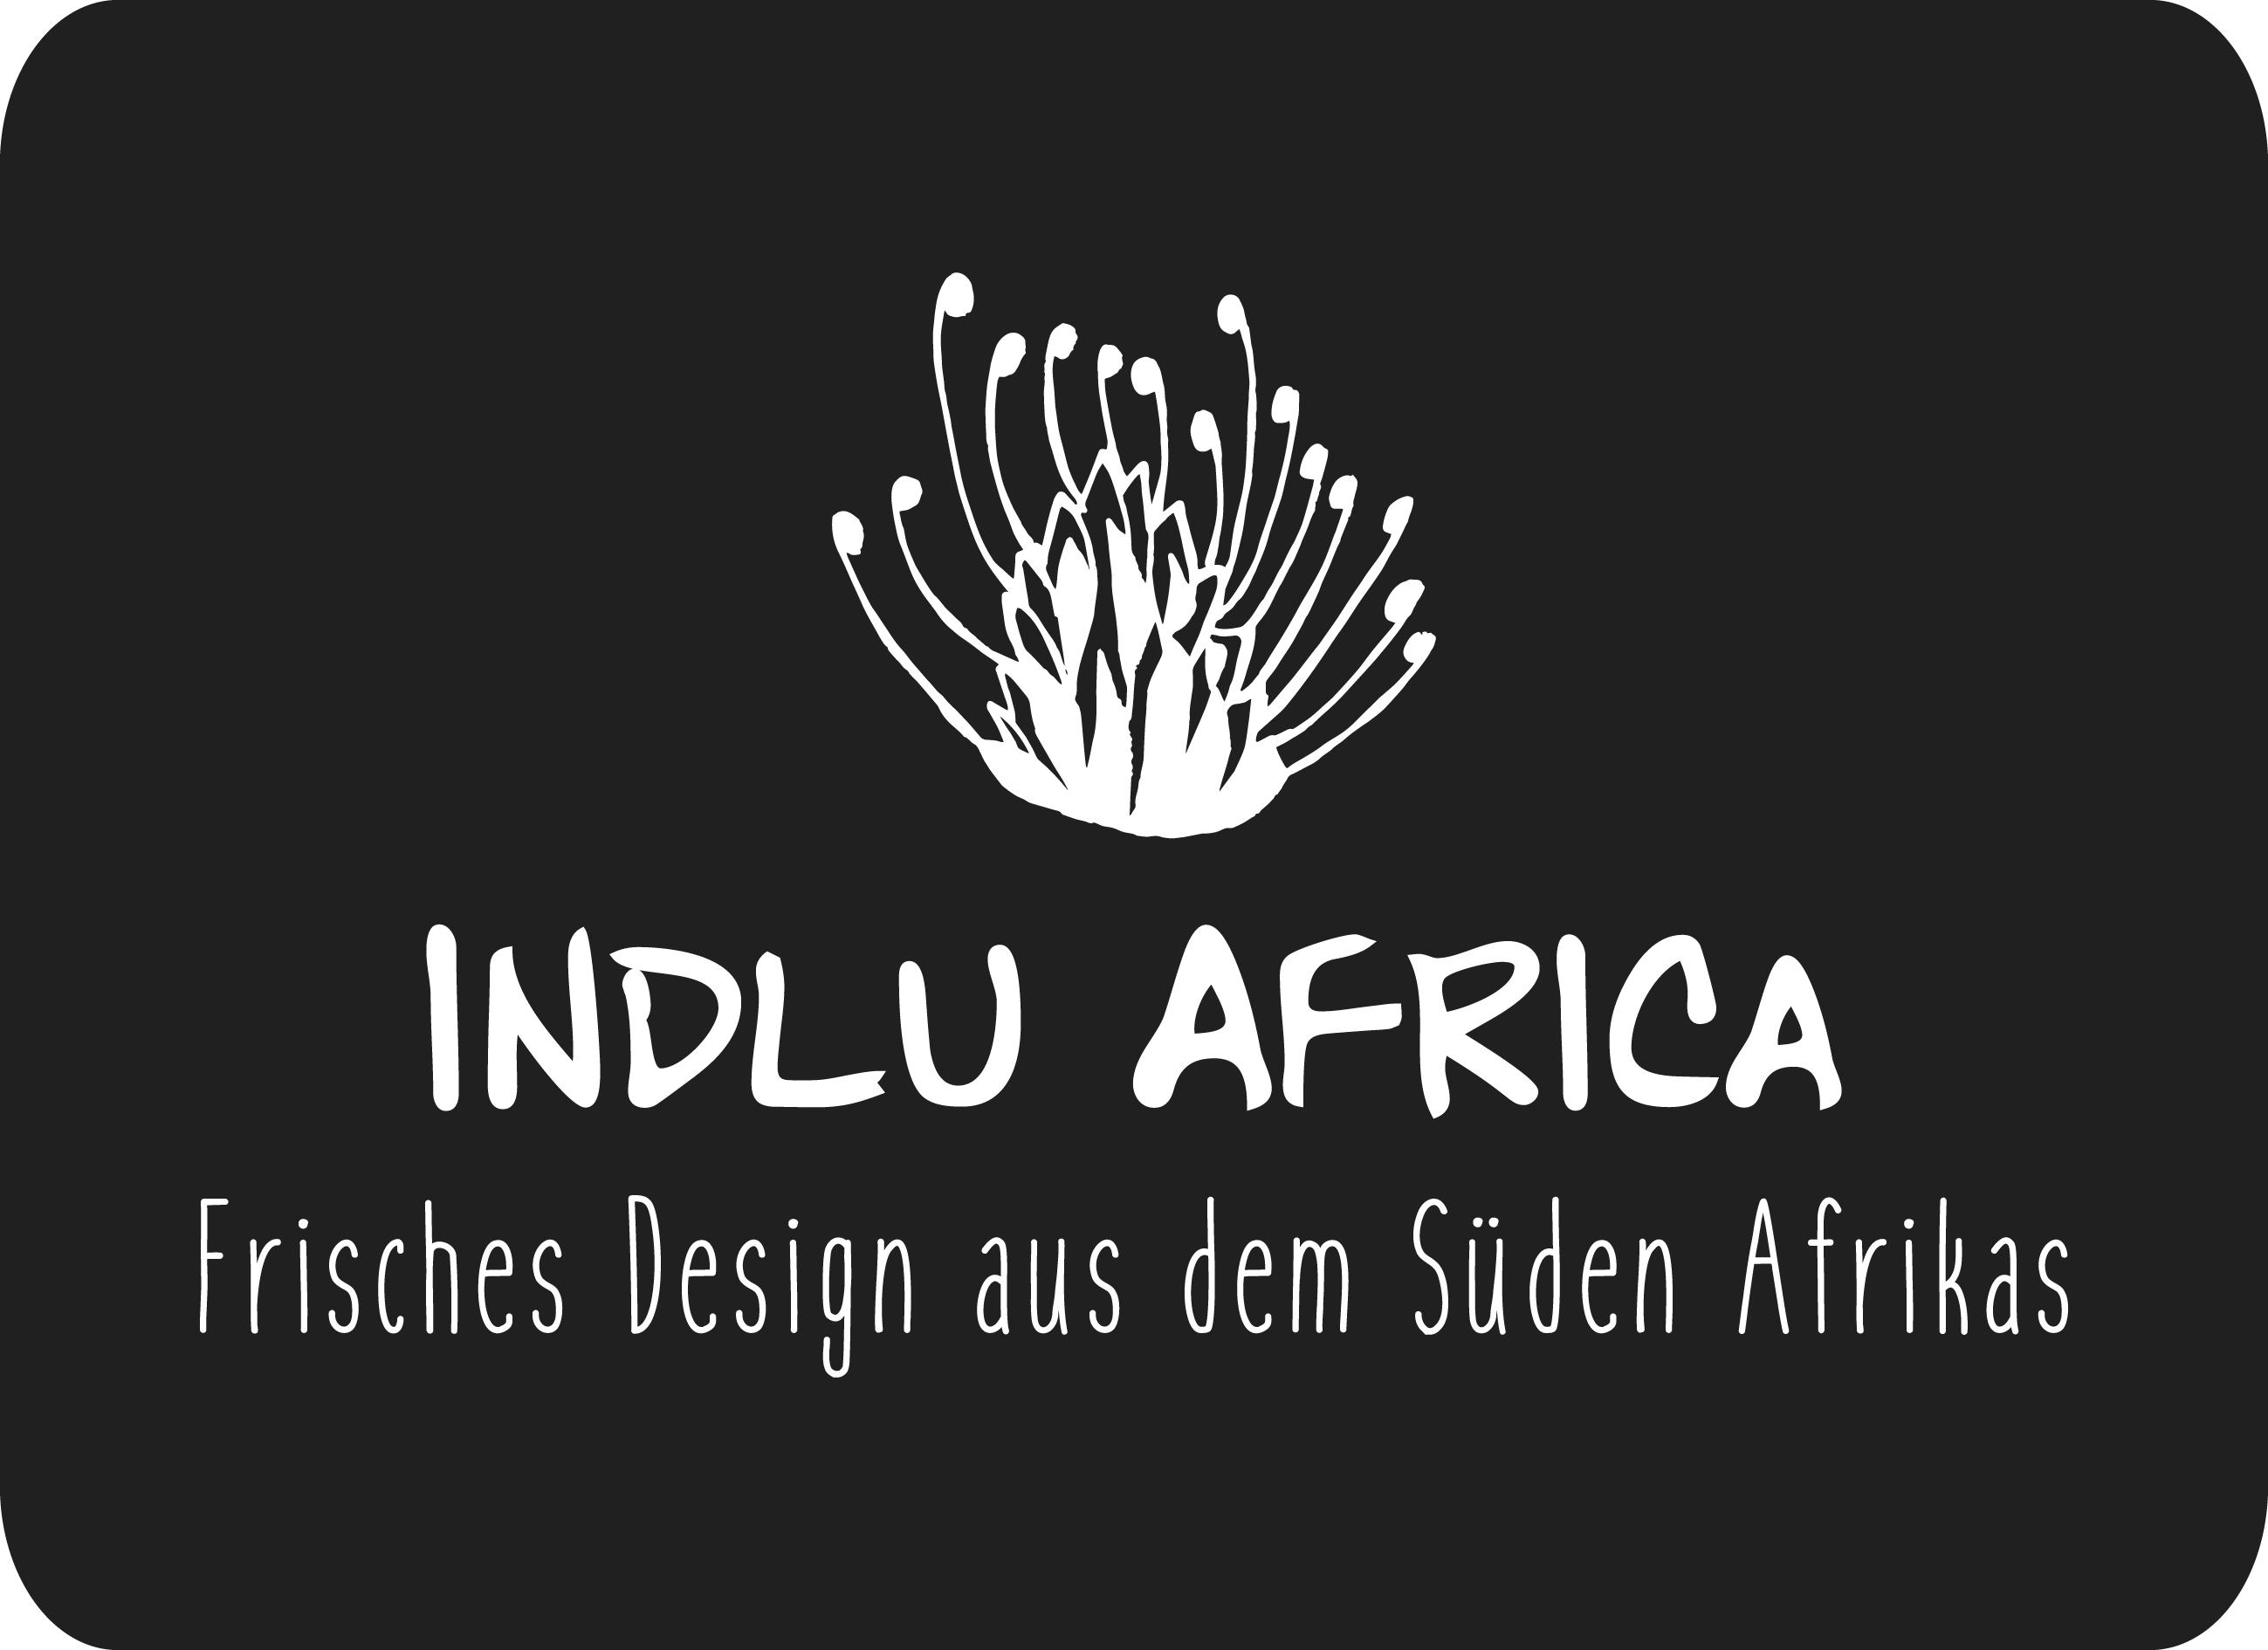 Indlu Africa